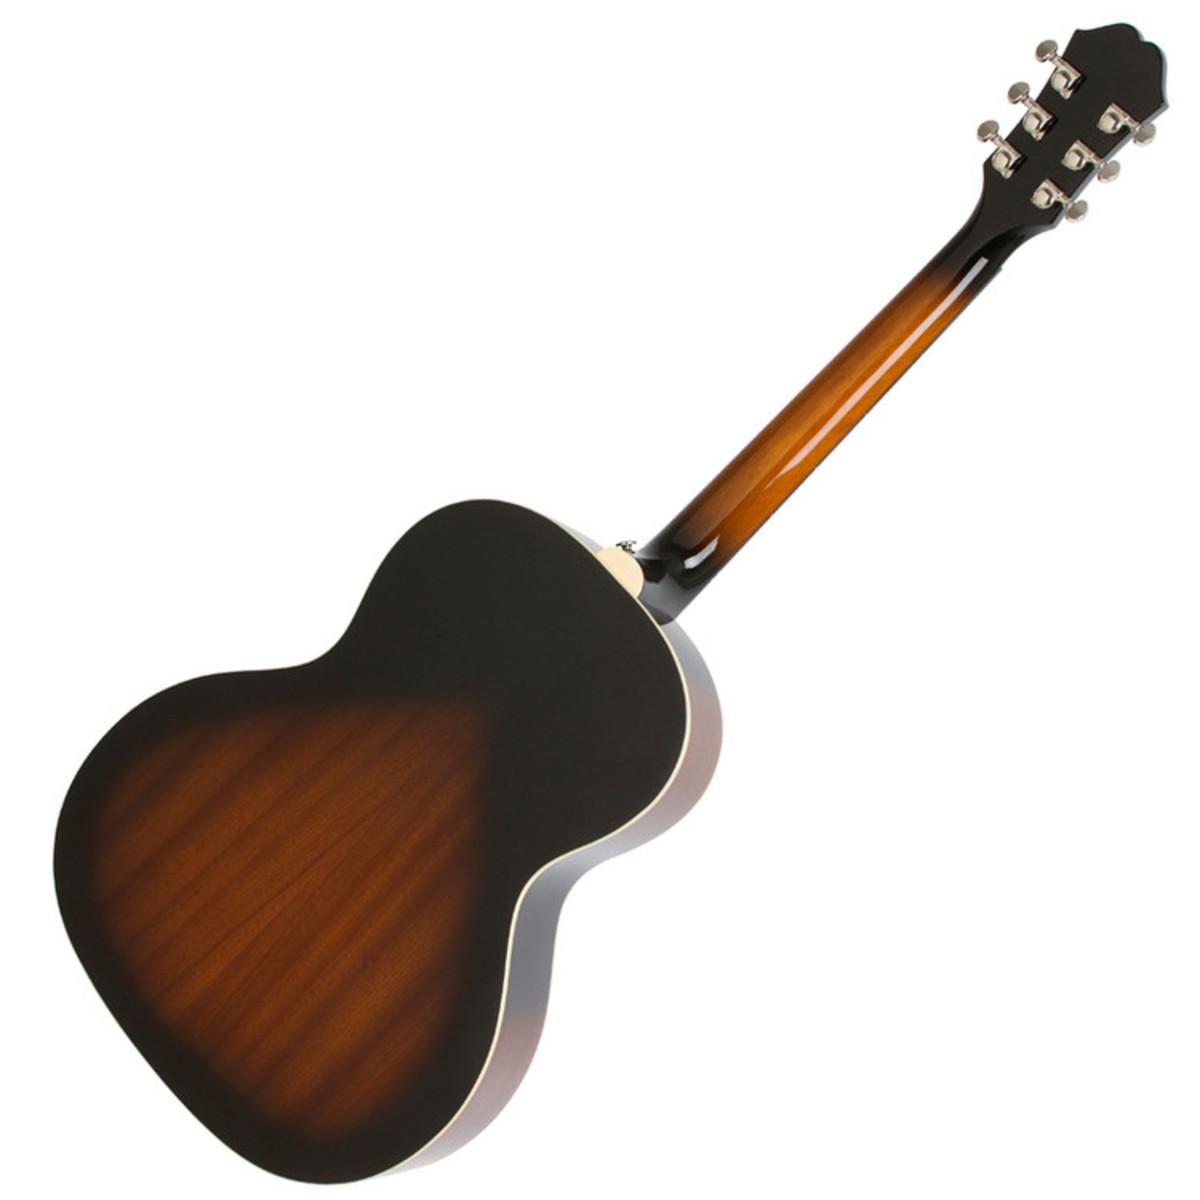 epiphone el 00 pro electro acoustic guitar sunburst nearly new at. Black Bedroom Furniture Sets. Home Design Ideas